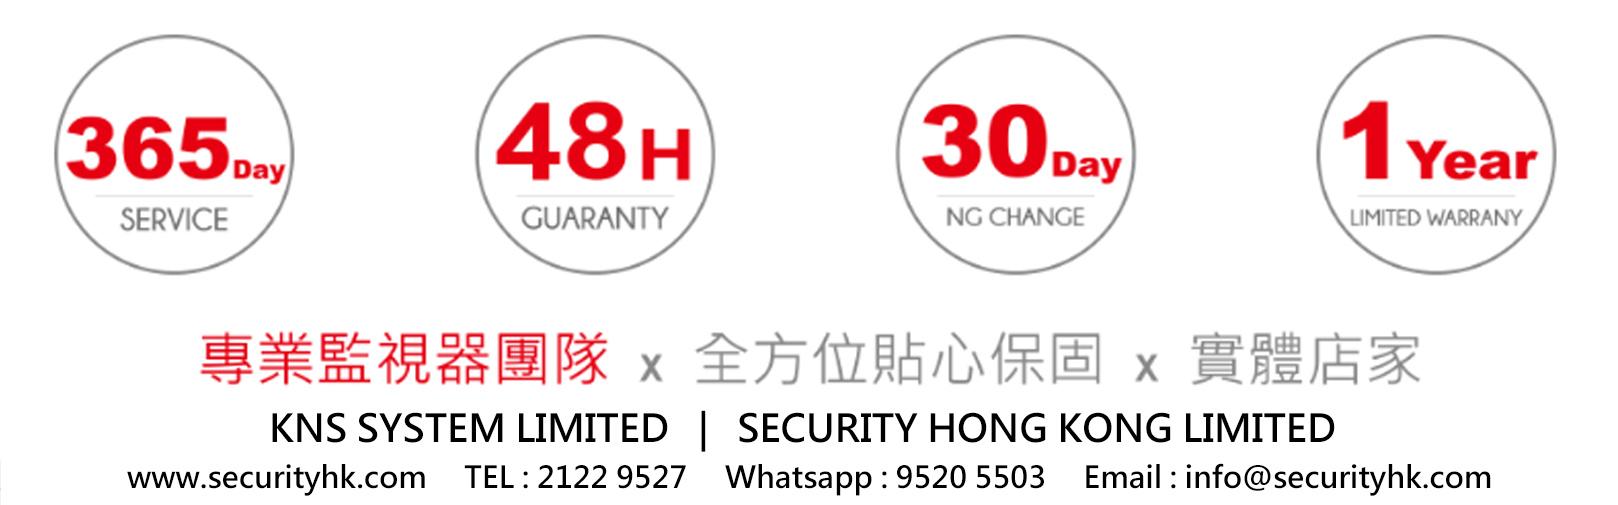 CCTV | Alarm Maintenance